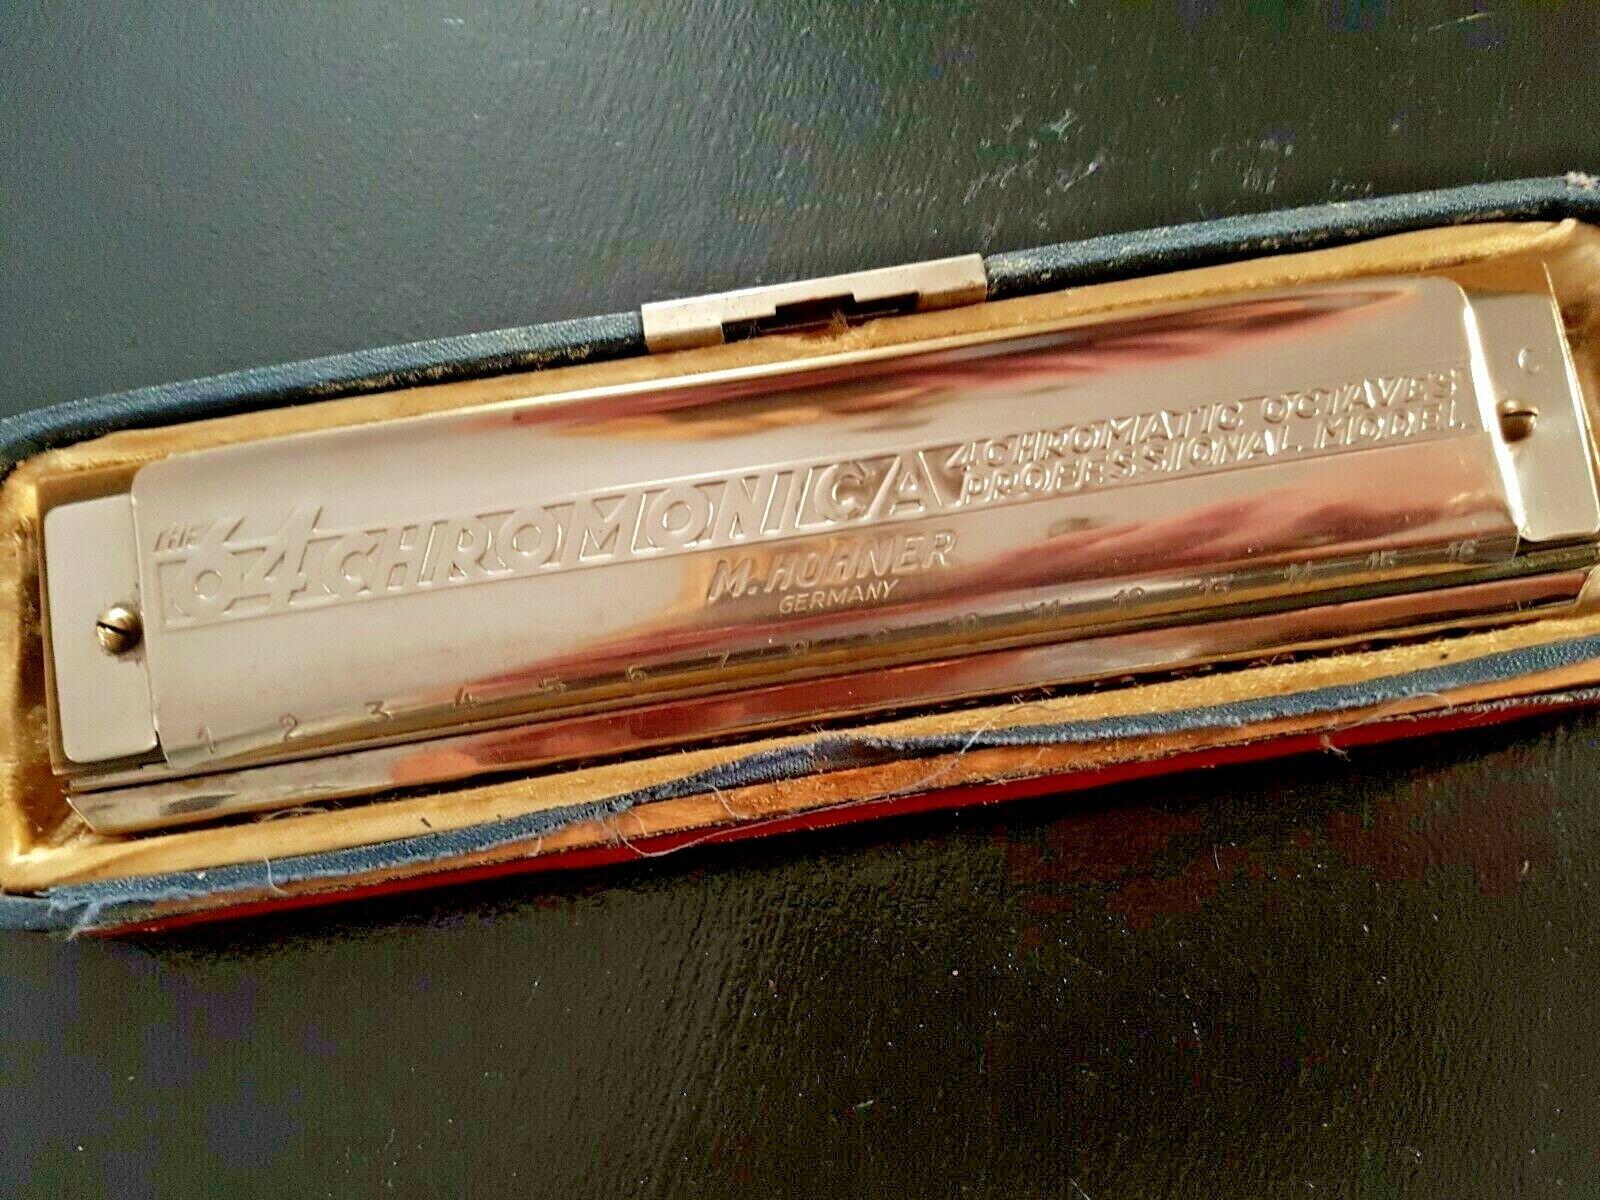 Harmonica 16 trous HOHNER 64 chromonica 4 chromatic octaves, vintage rétro